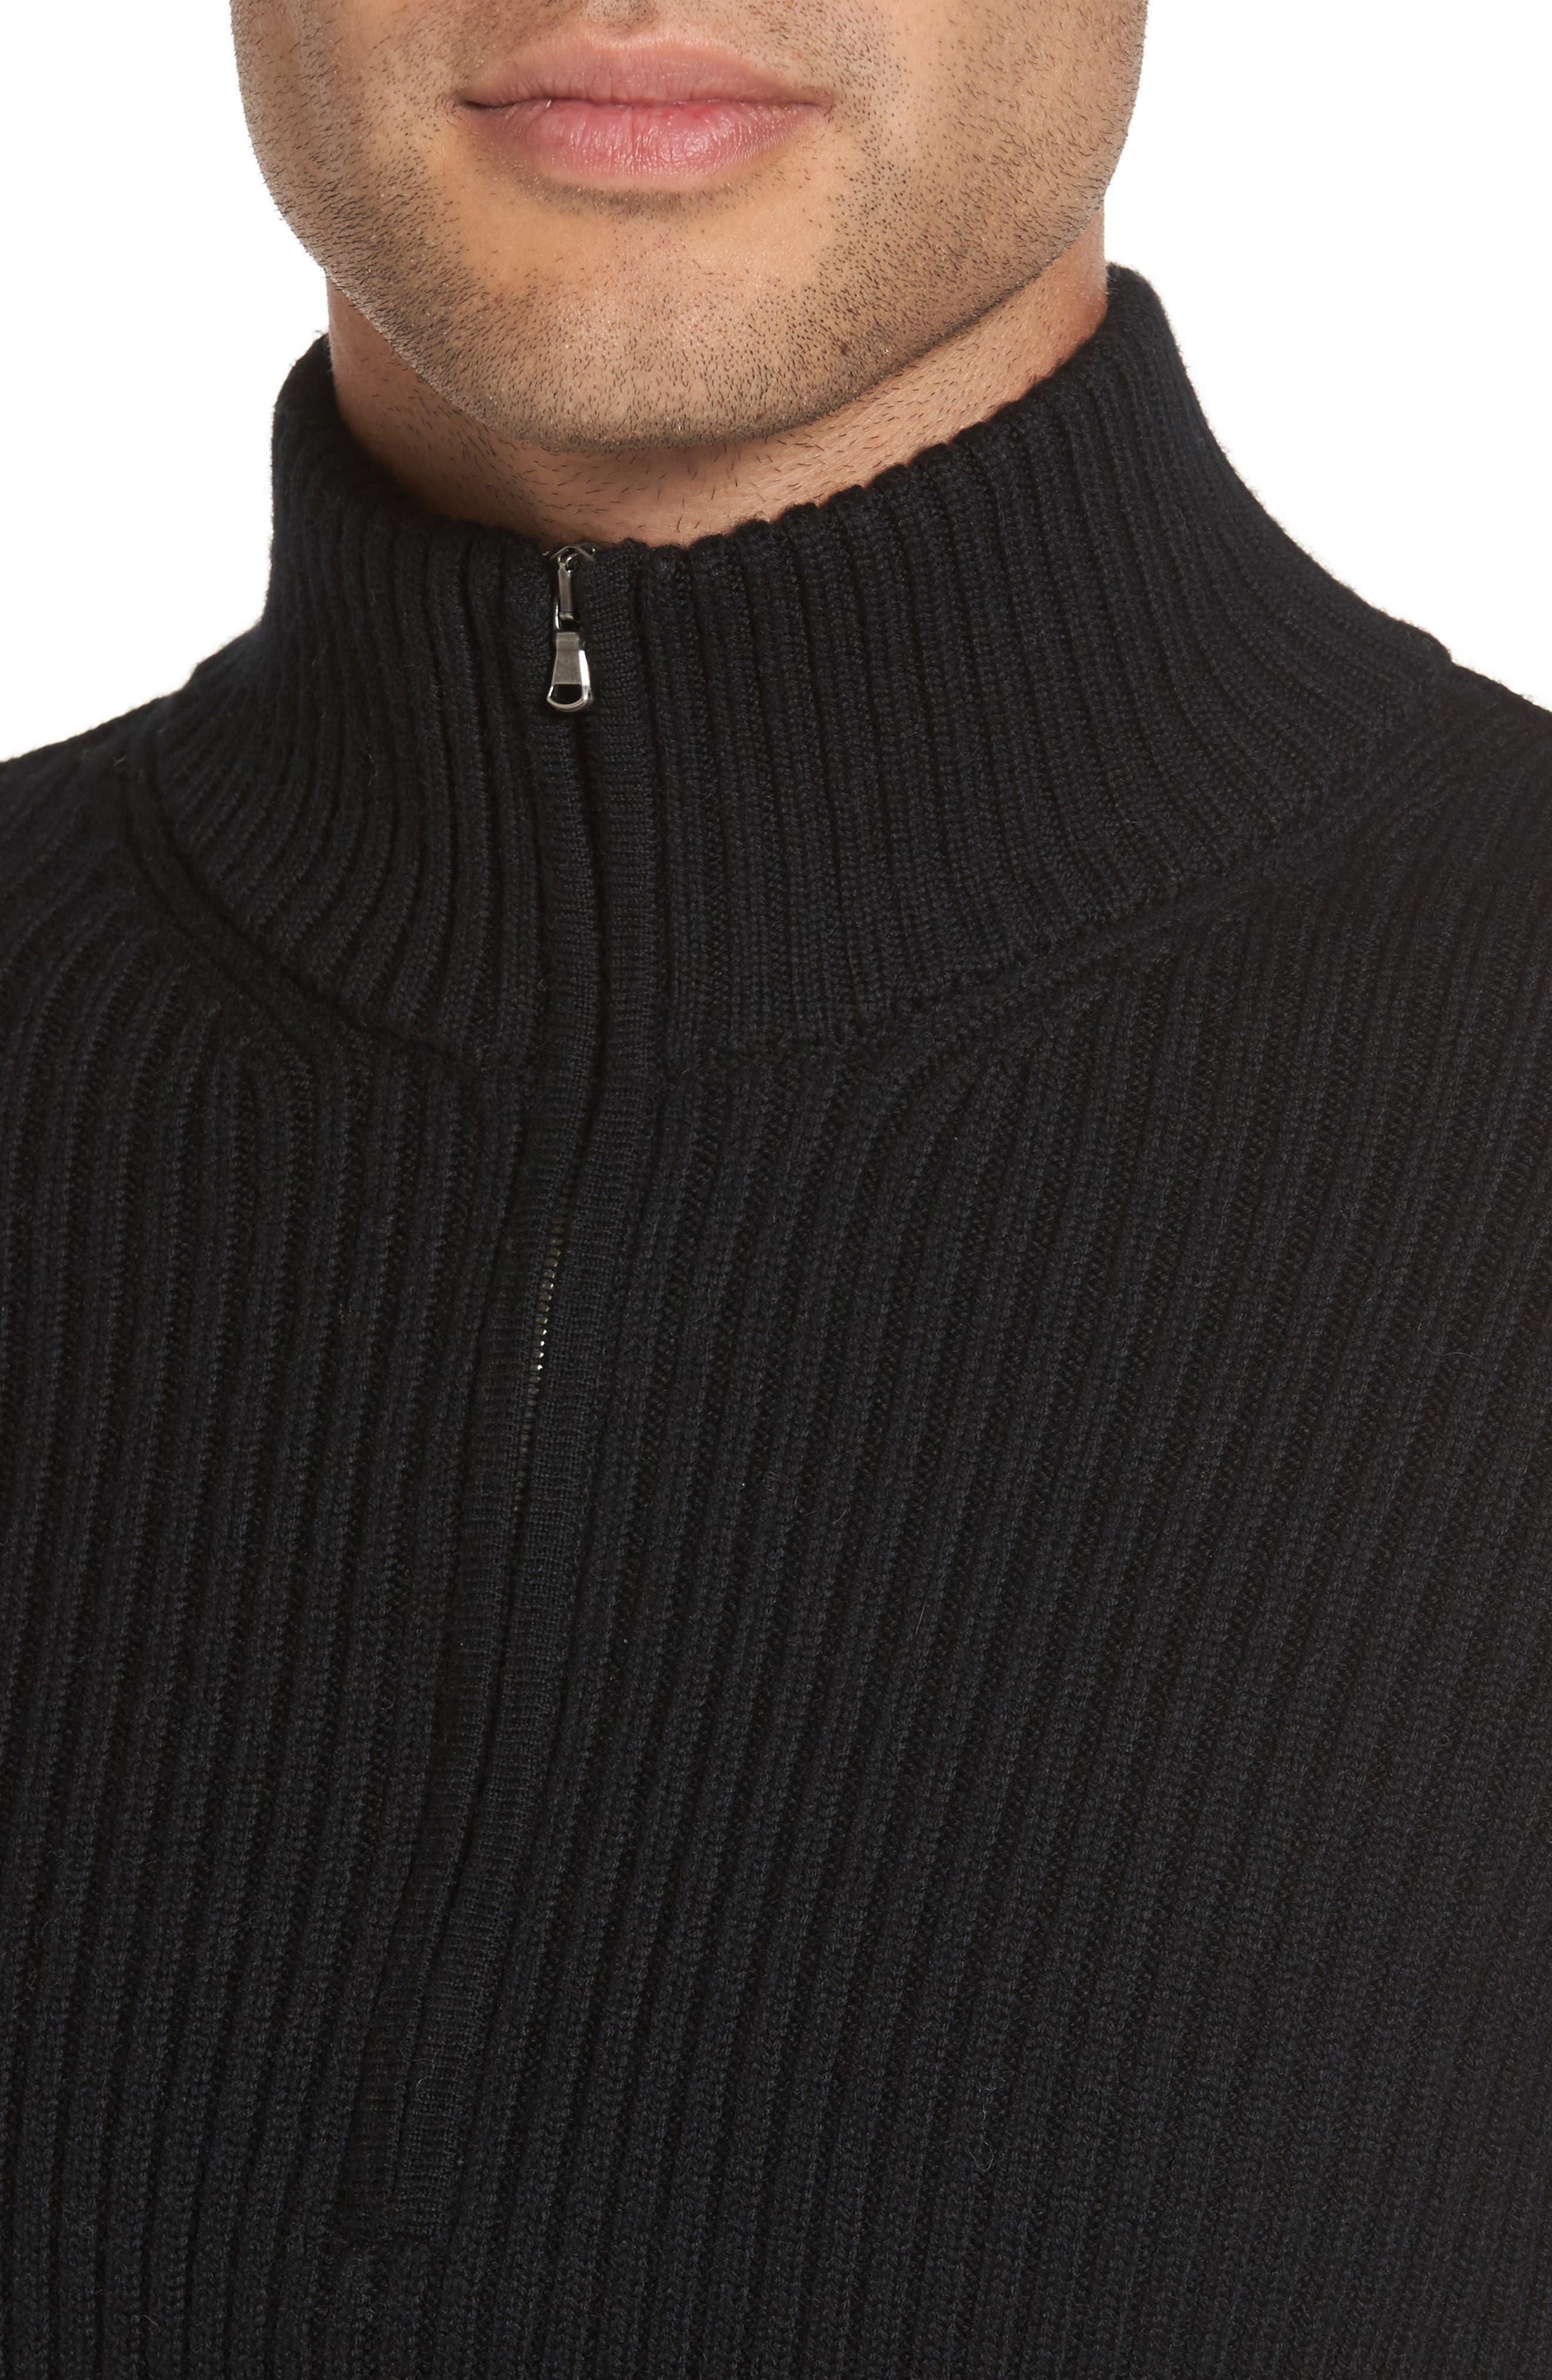 Ribbed Quarter Zip Mock Neck Sweater,                             Alternate thumbnail 4, color,                             Black